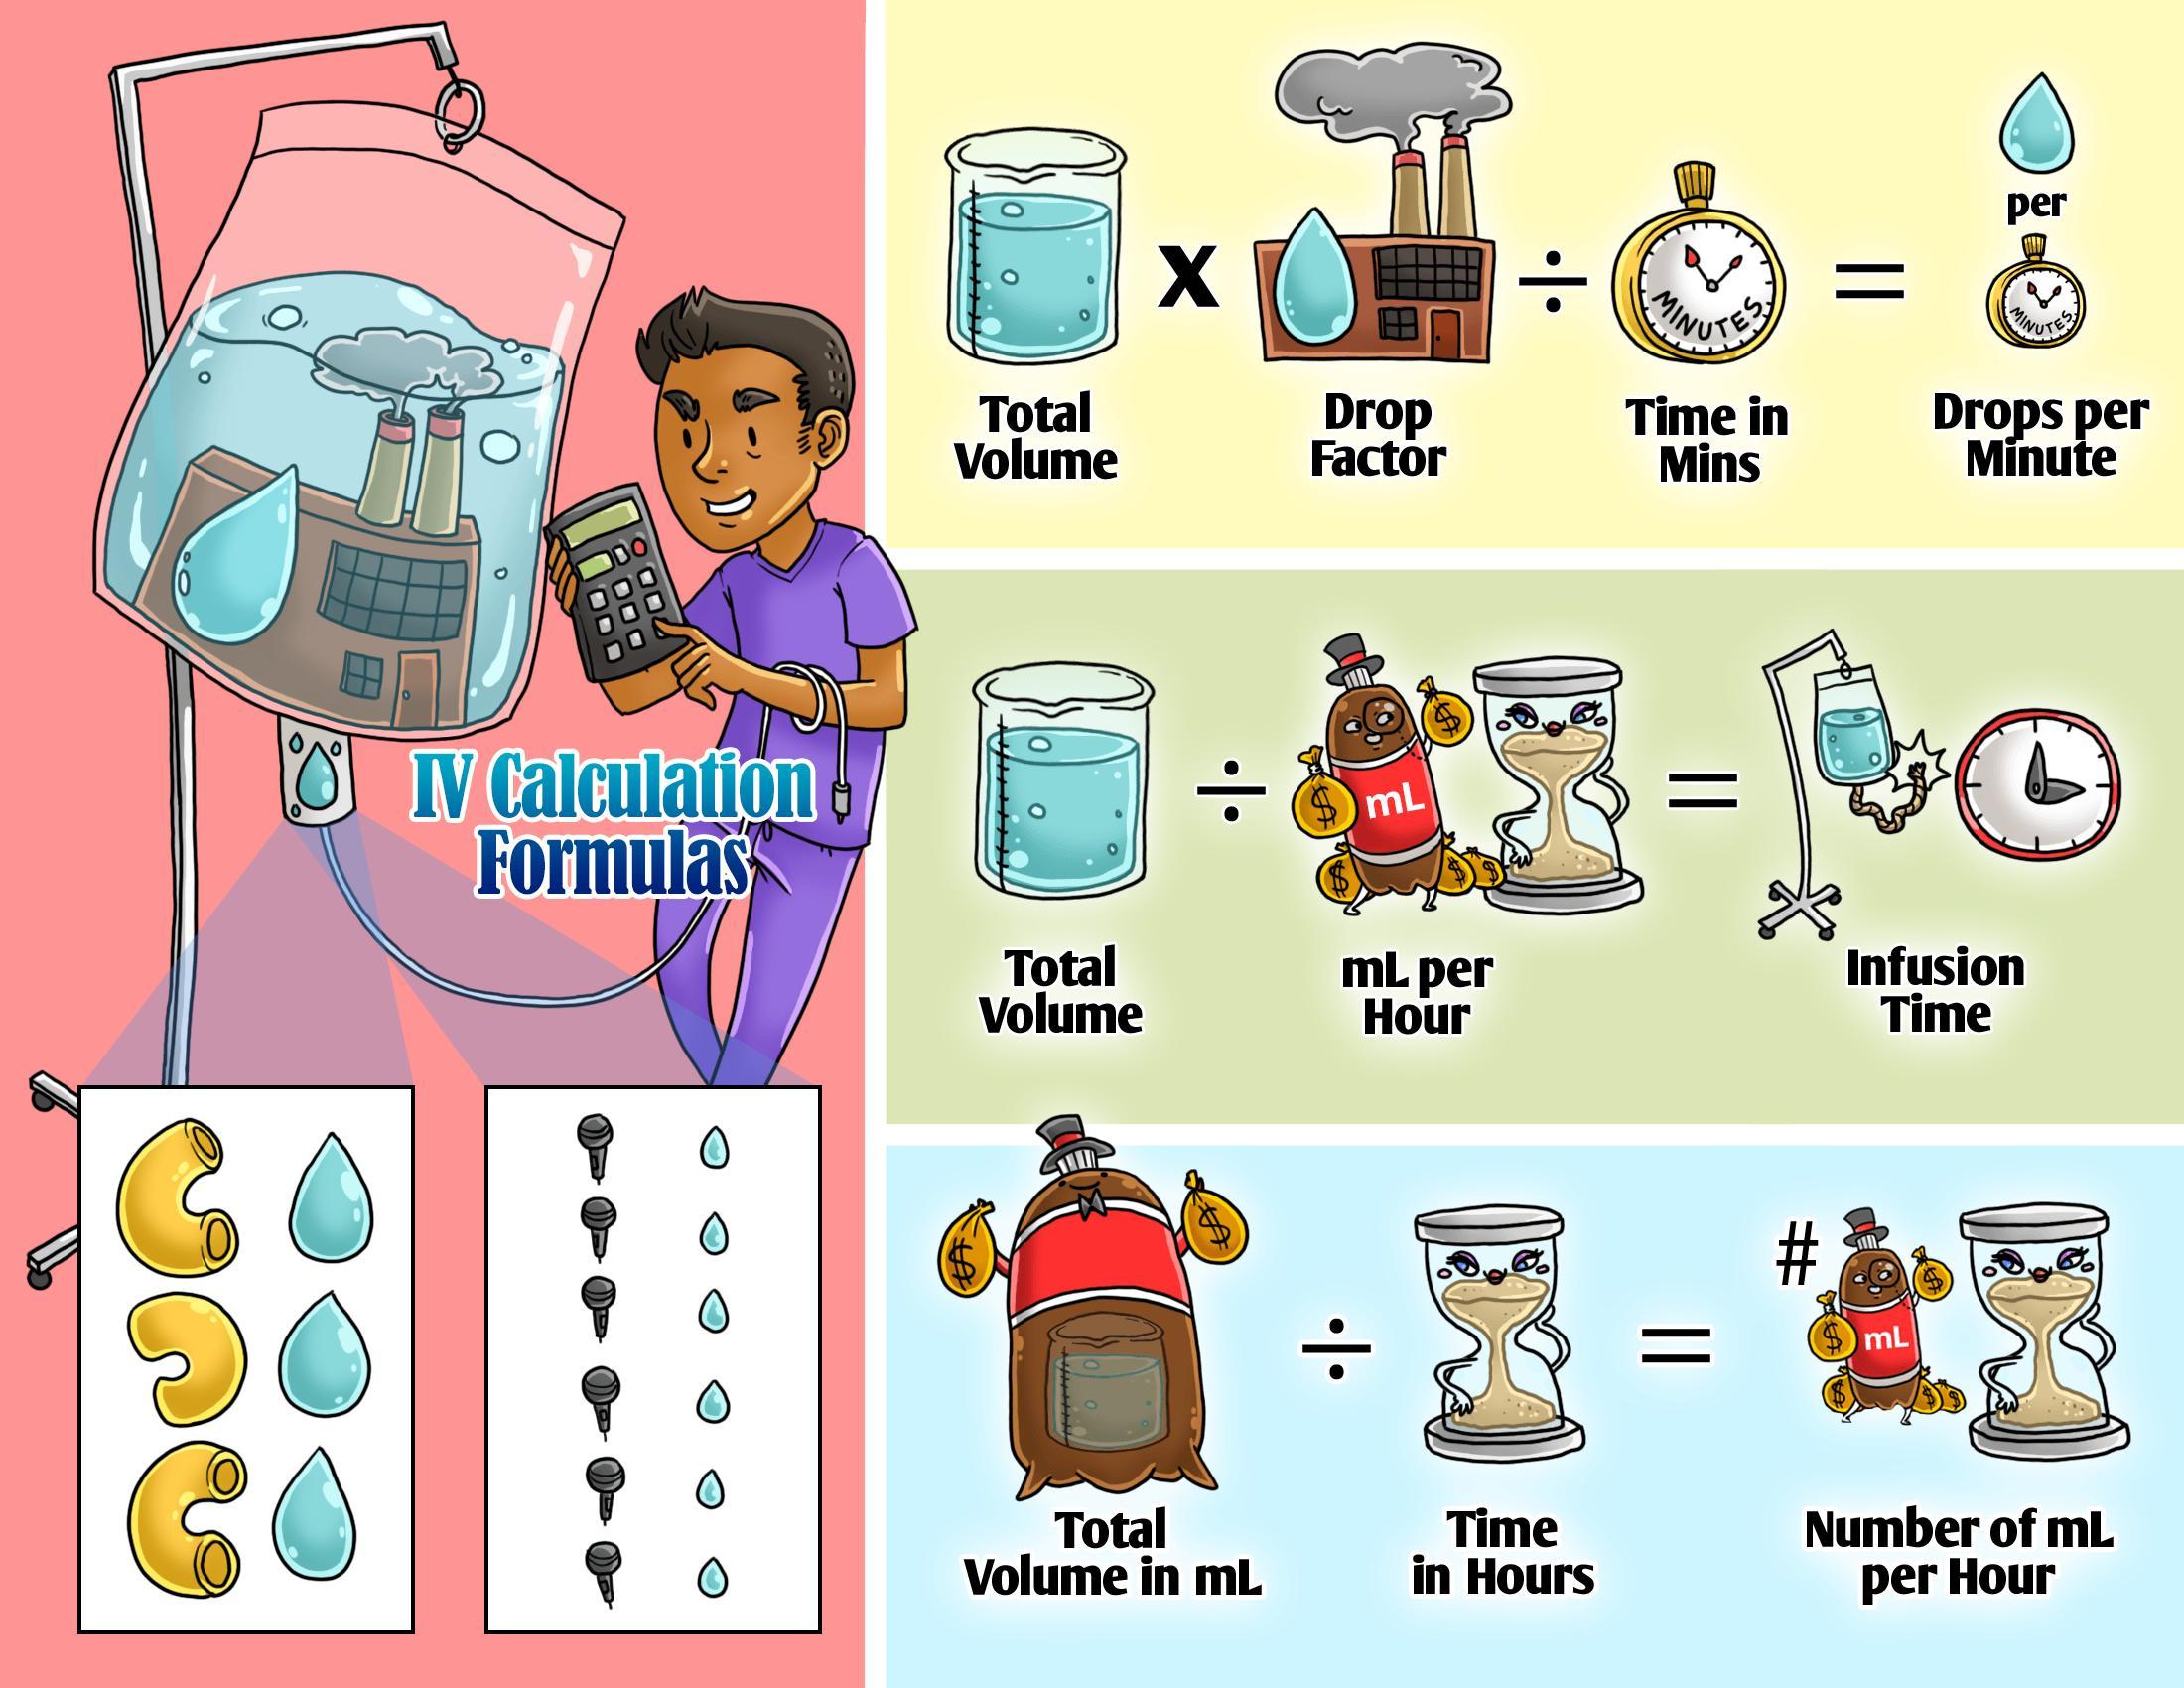 IV Calculation Formulas